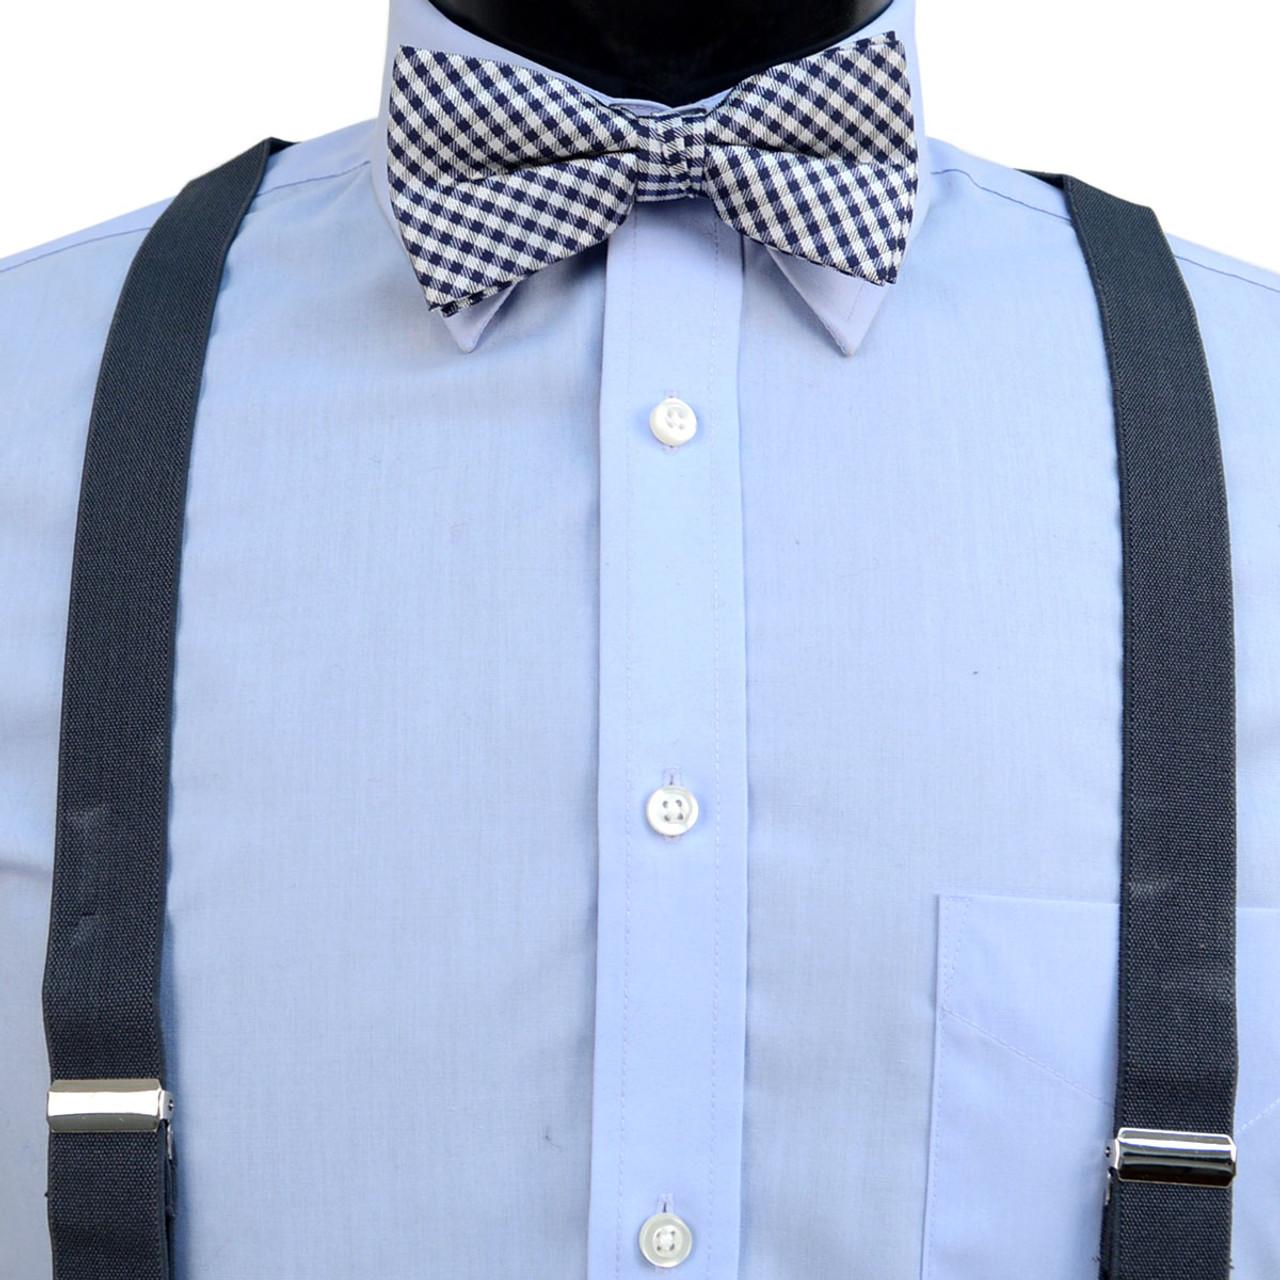 3dd094e29b5e 3pc Men's Charcoal Clip-on Suspenders, Checkered Bow Tie & Hanky Sets -  FYBTHSU-CHAR#1